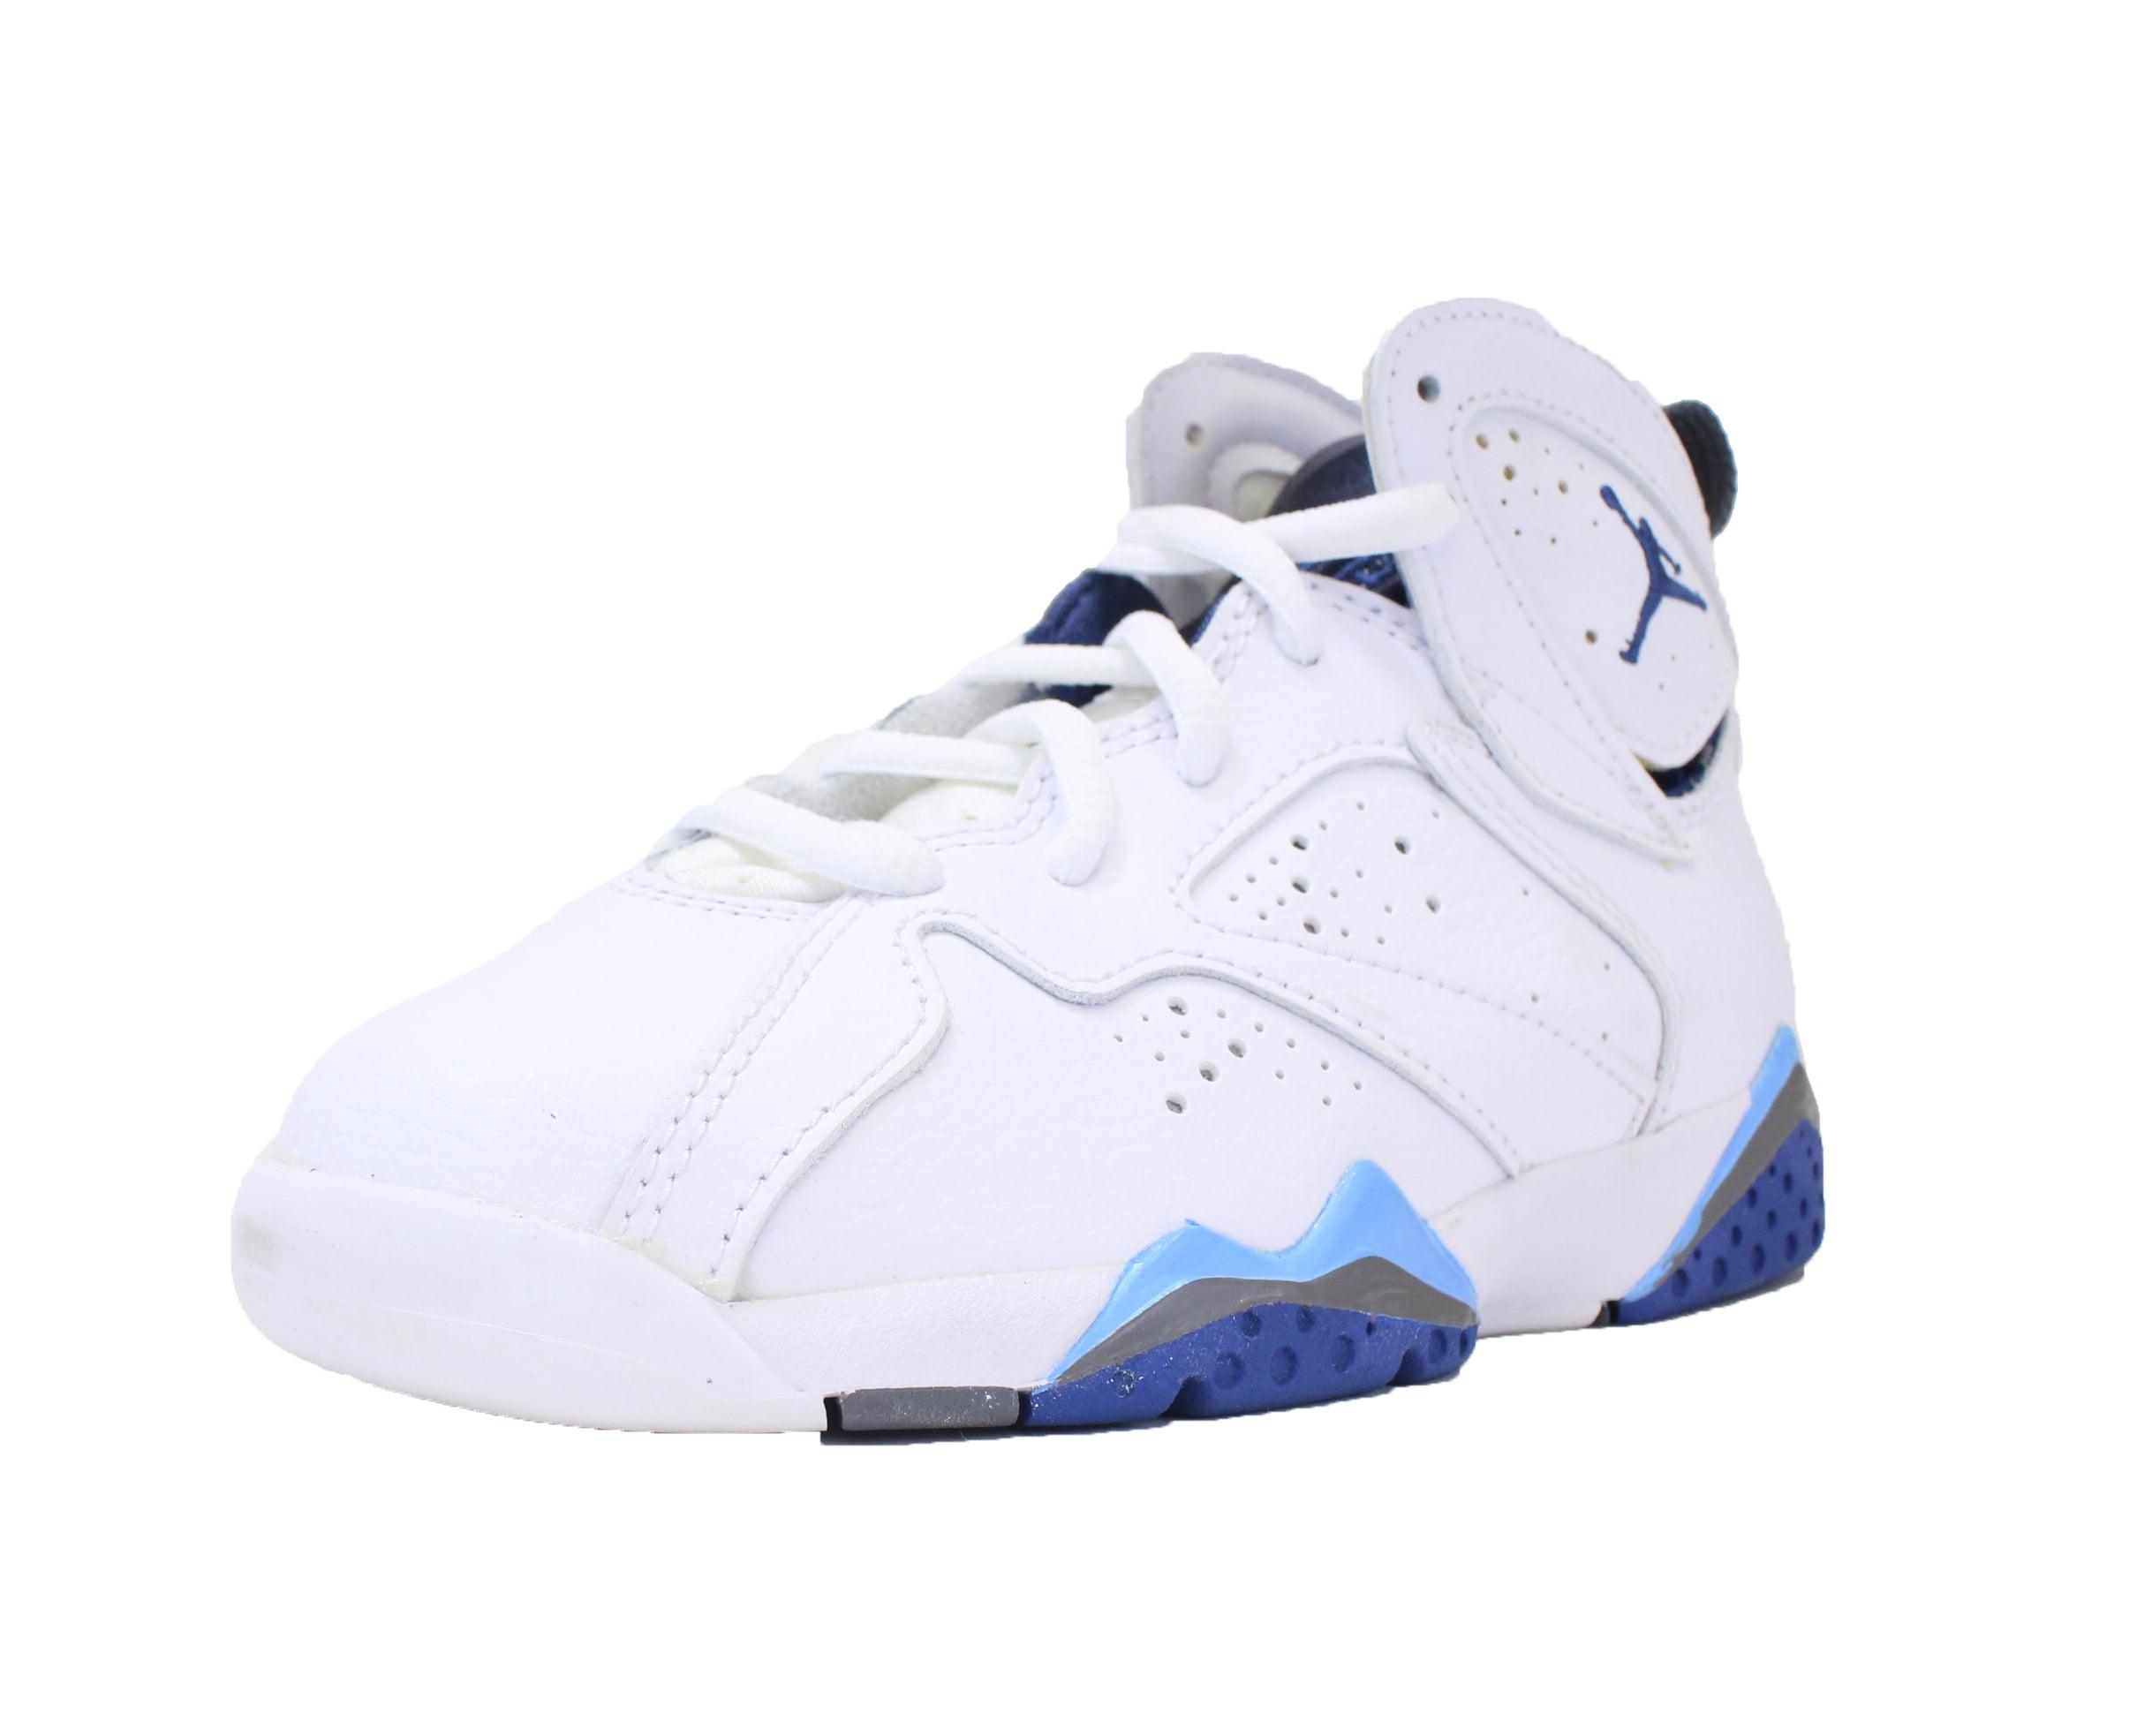 great fit 76446 9365e ... clearance air jordan 7 retro vii bp ps 13.5 c white french blue flint  grey 304773 ...